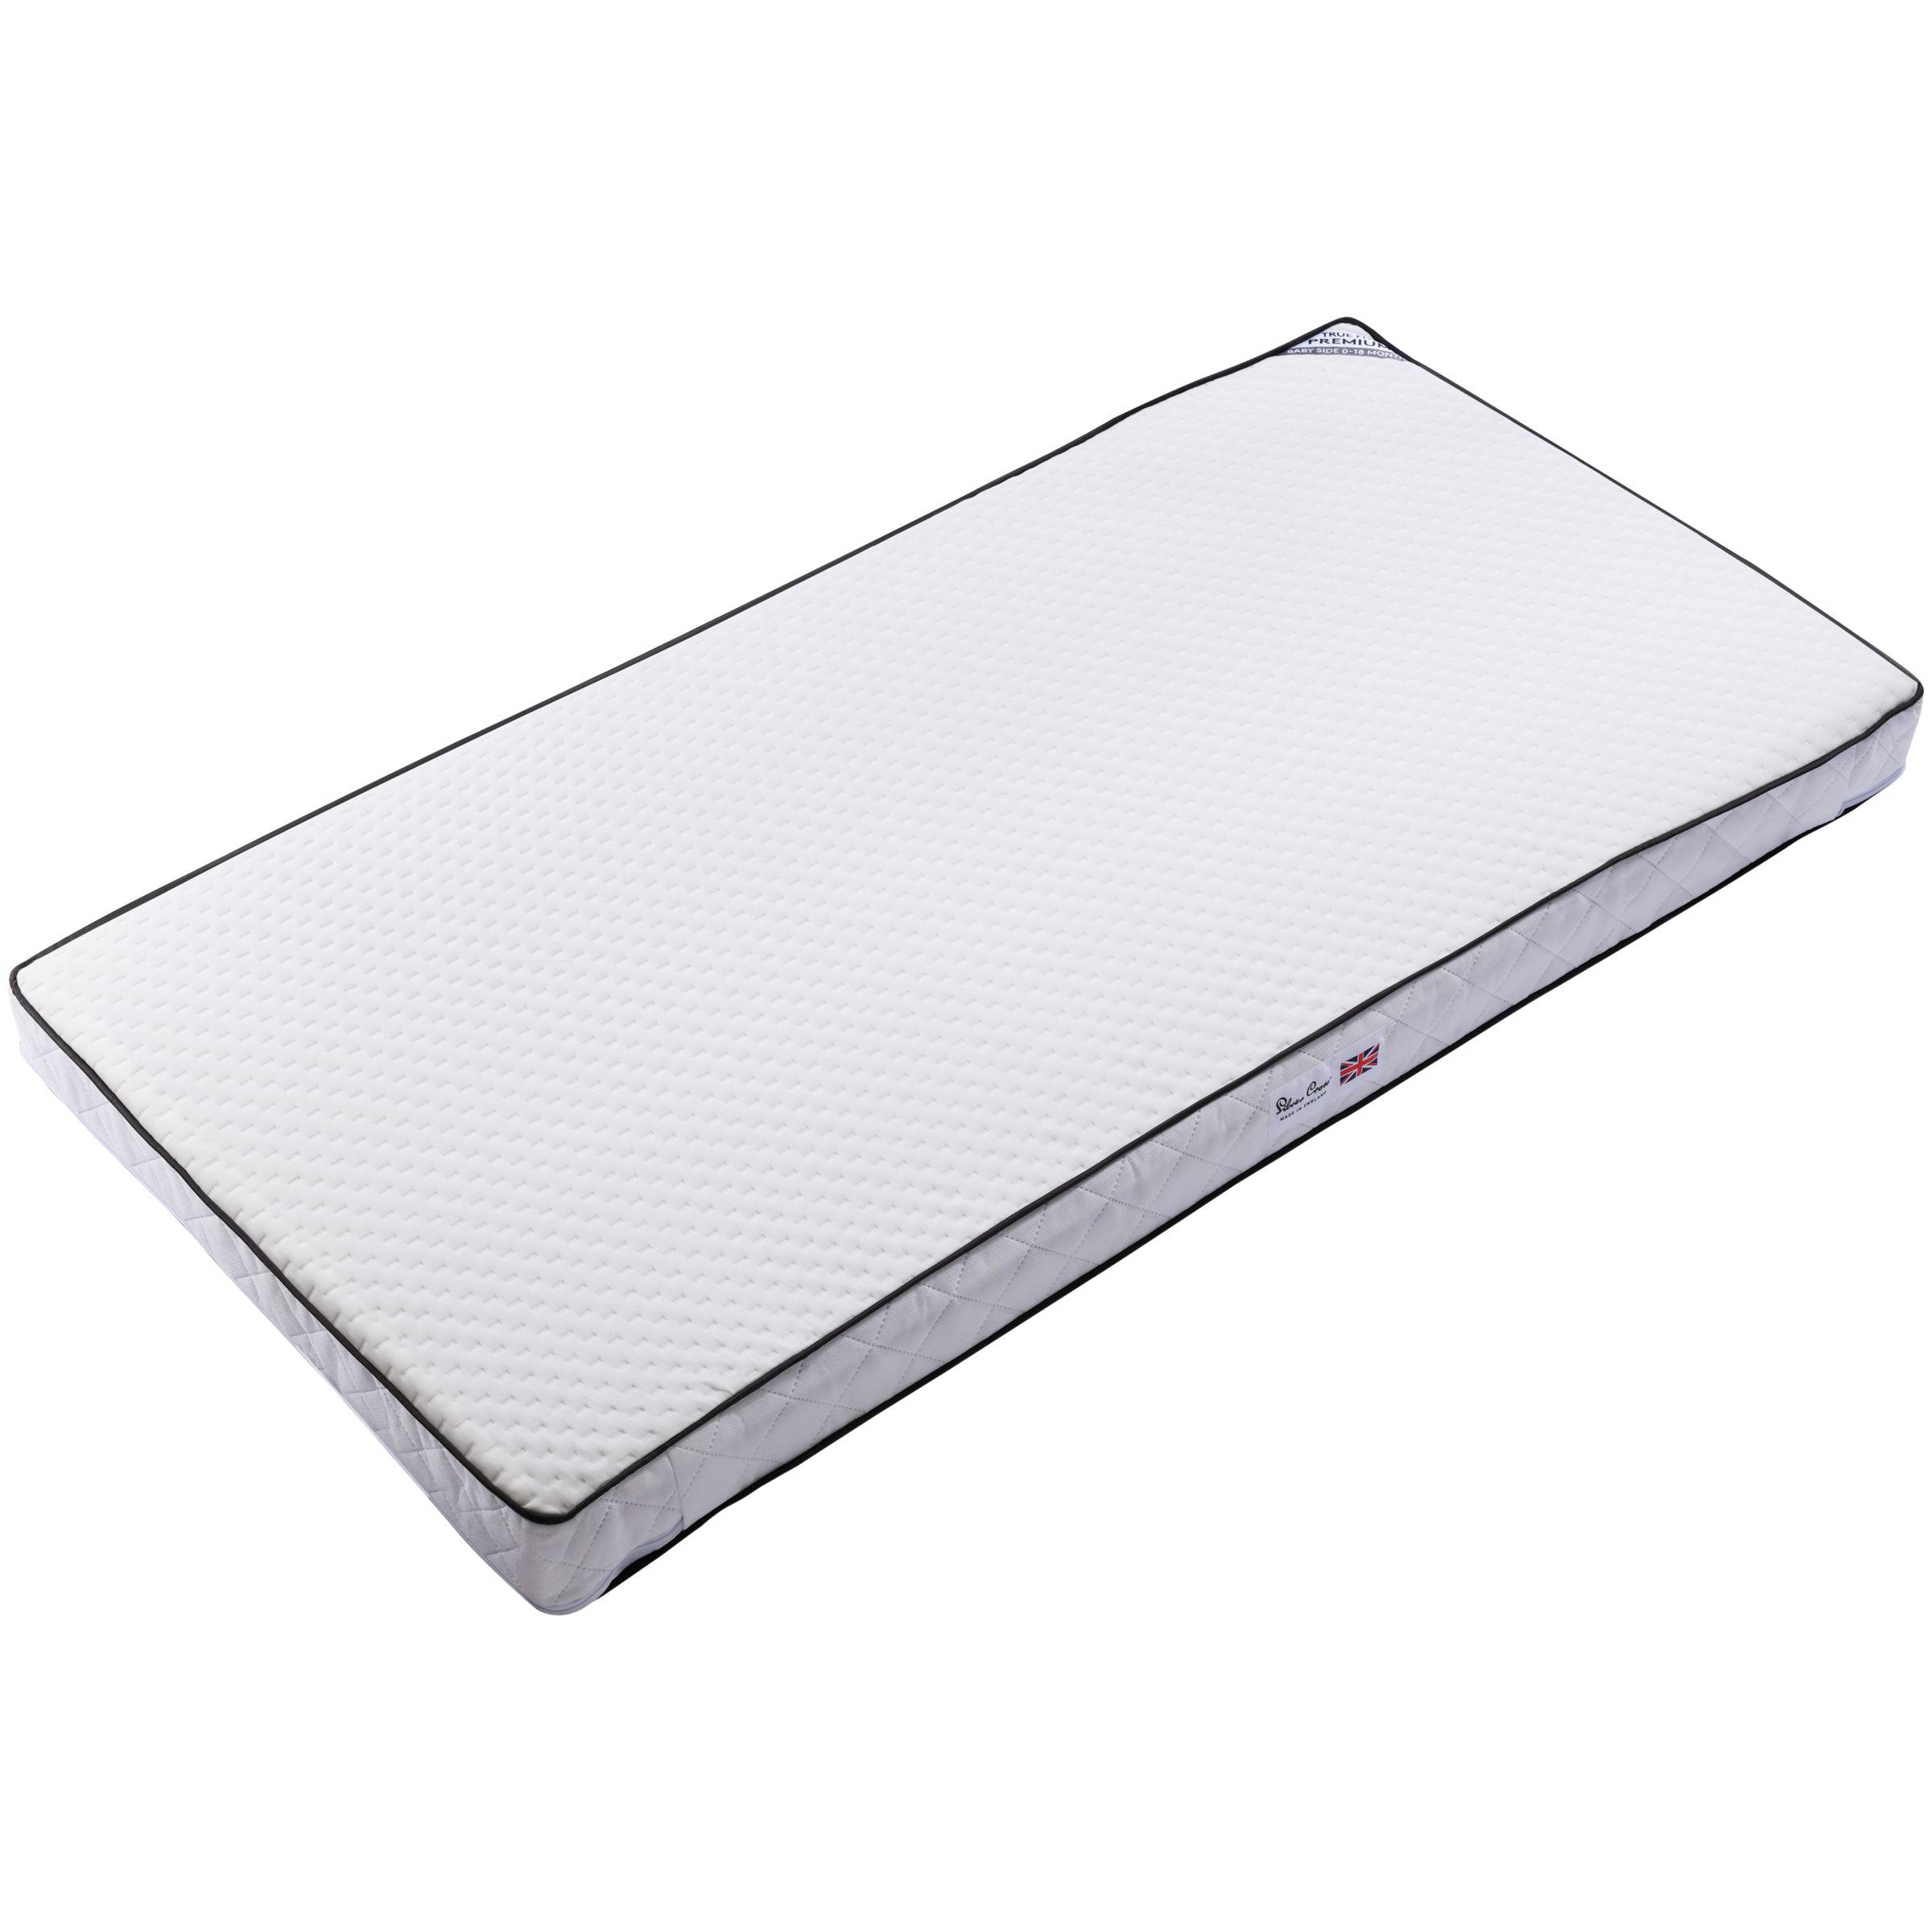 Silver Cross Premium True Fit TM Cotbed Mattress, 140cm x 70cm